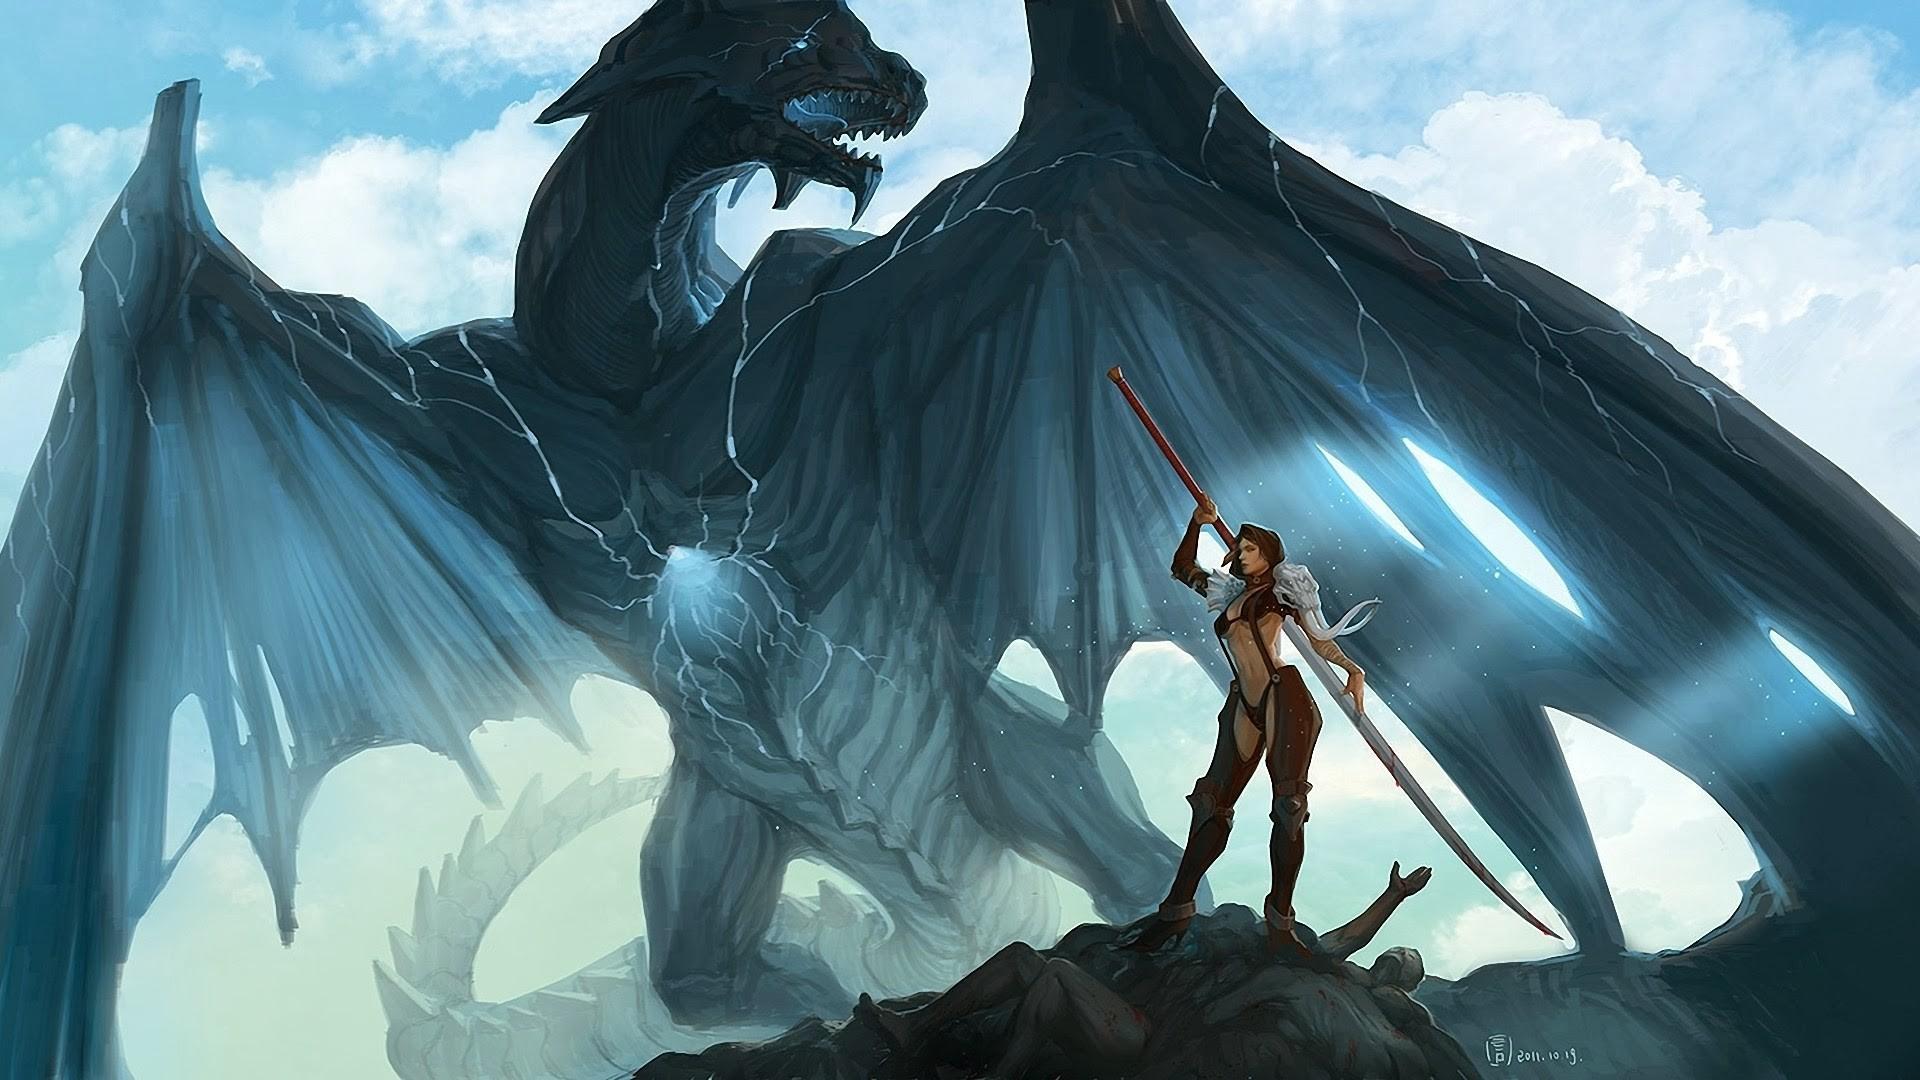 dragon fantasy warrior girl wallpaper hd a691.